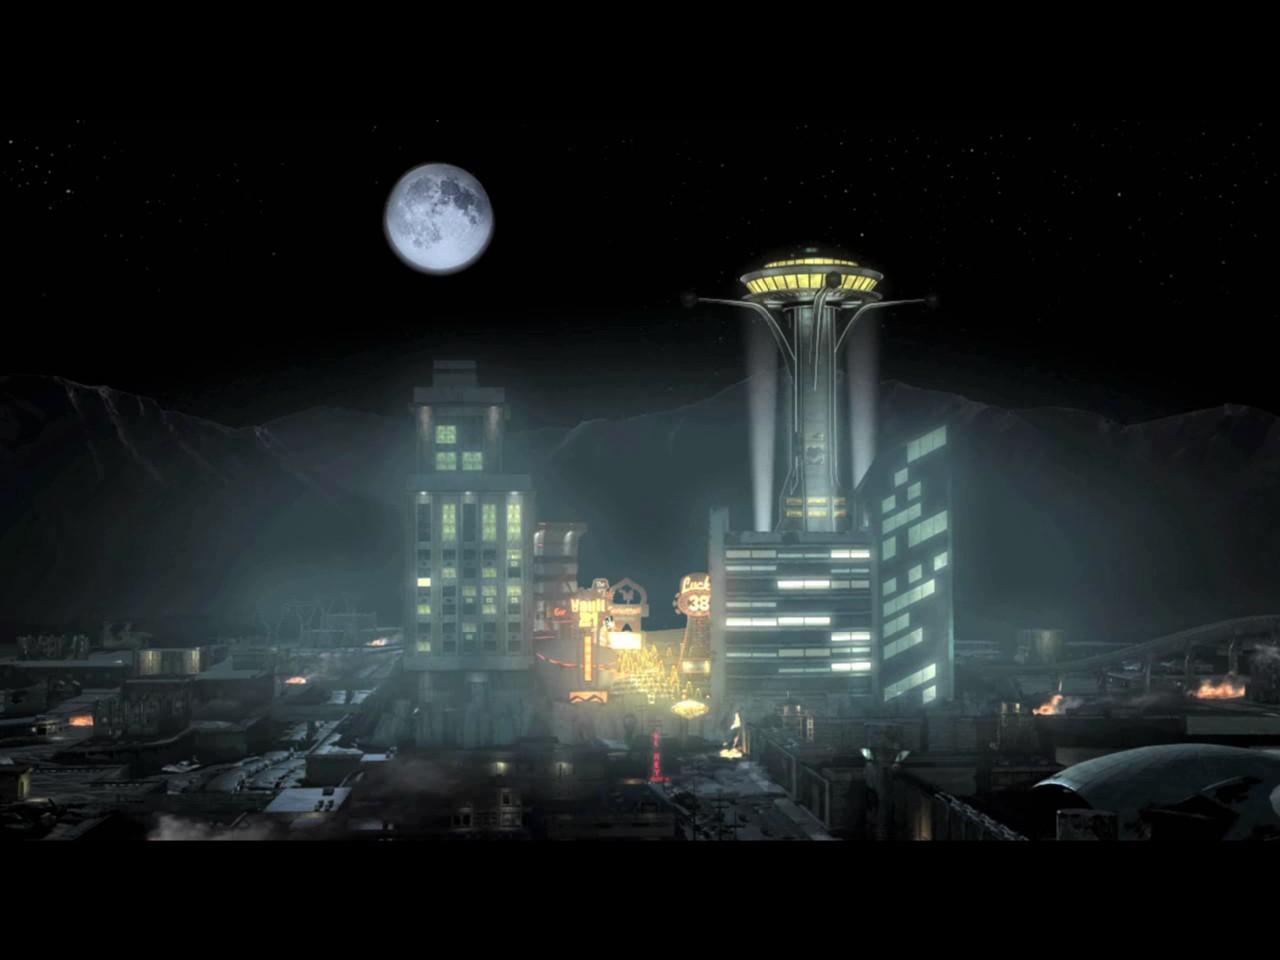 20190101090427_1.jpg - Fallout: New Vegas